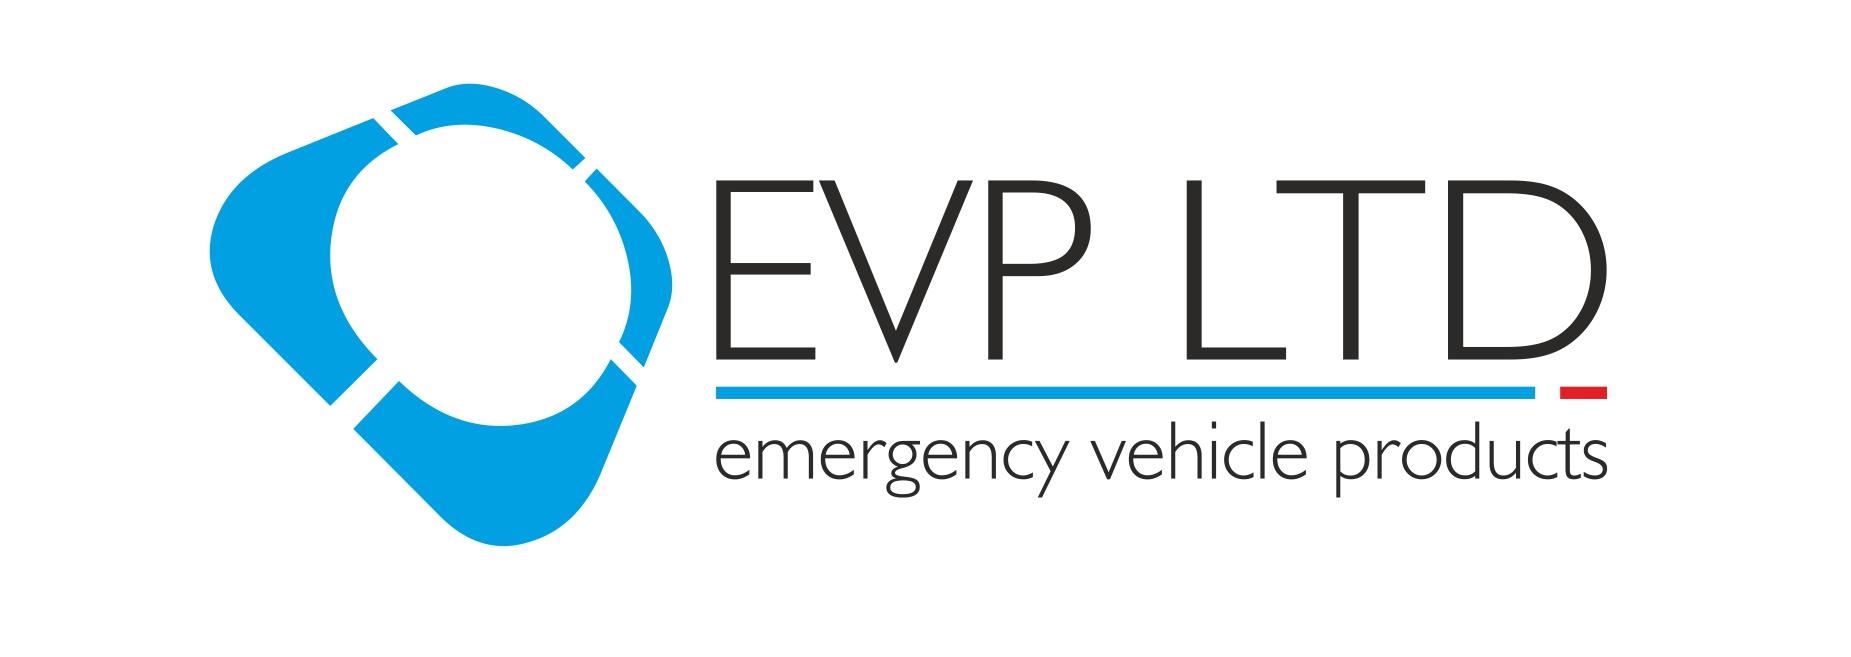 EVPLTD_logo_jpg_rgb